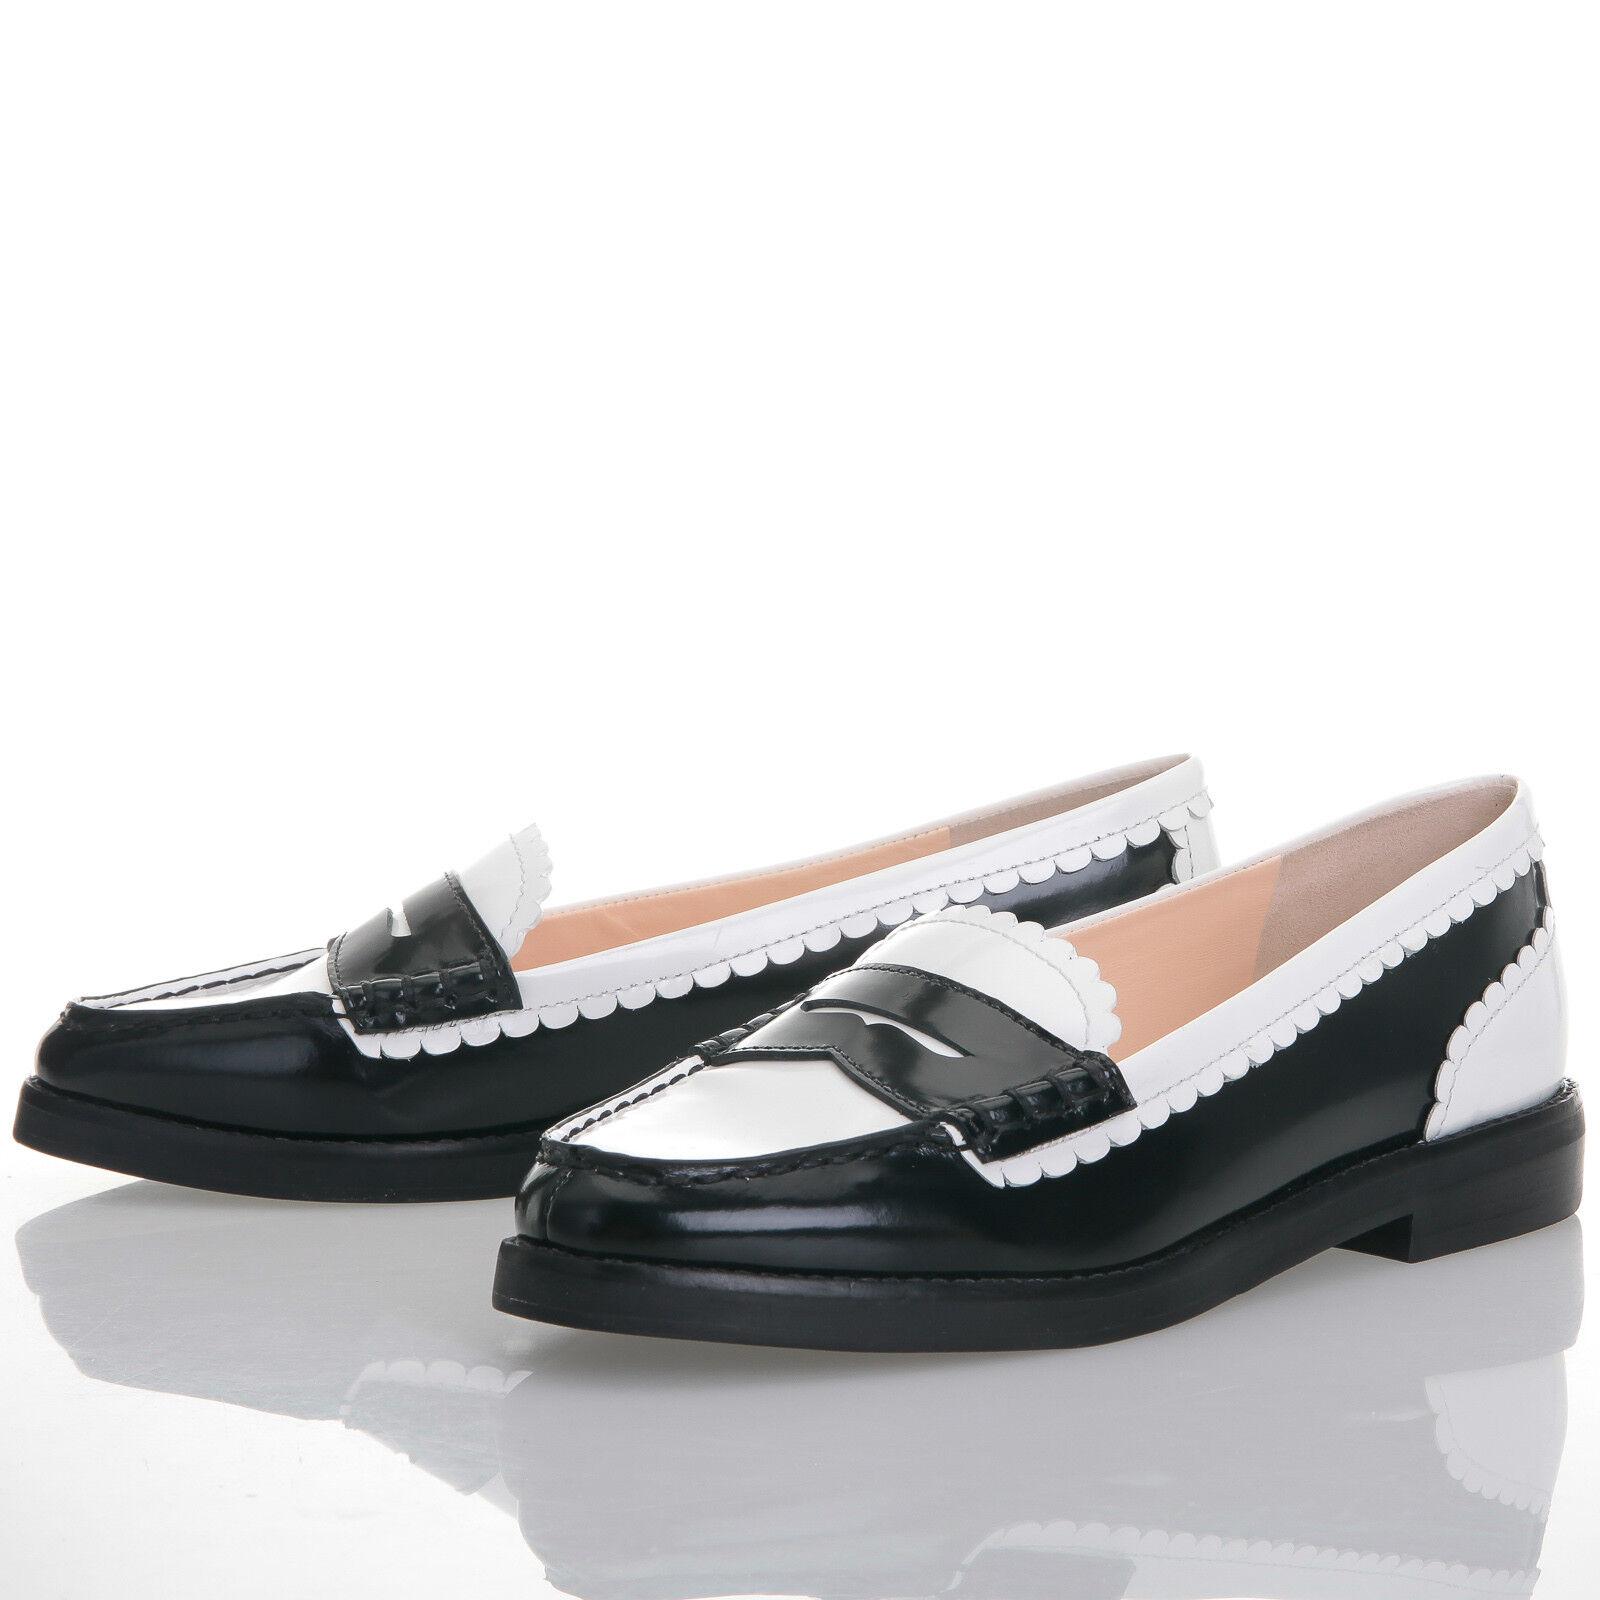 ultimi stili Isa Tapia Caroline bianca bianca bianca & nero Scalloped Leather Penny Loafers - Dimensione 37.5 EU  marchi di moda